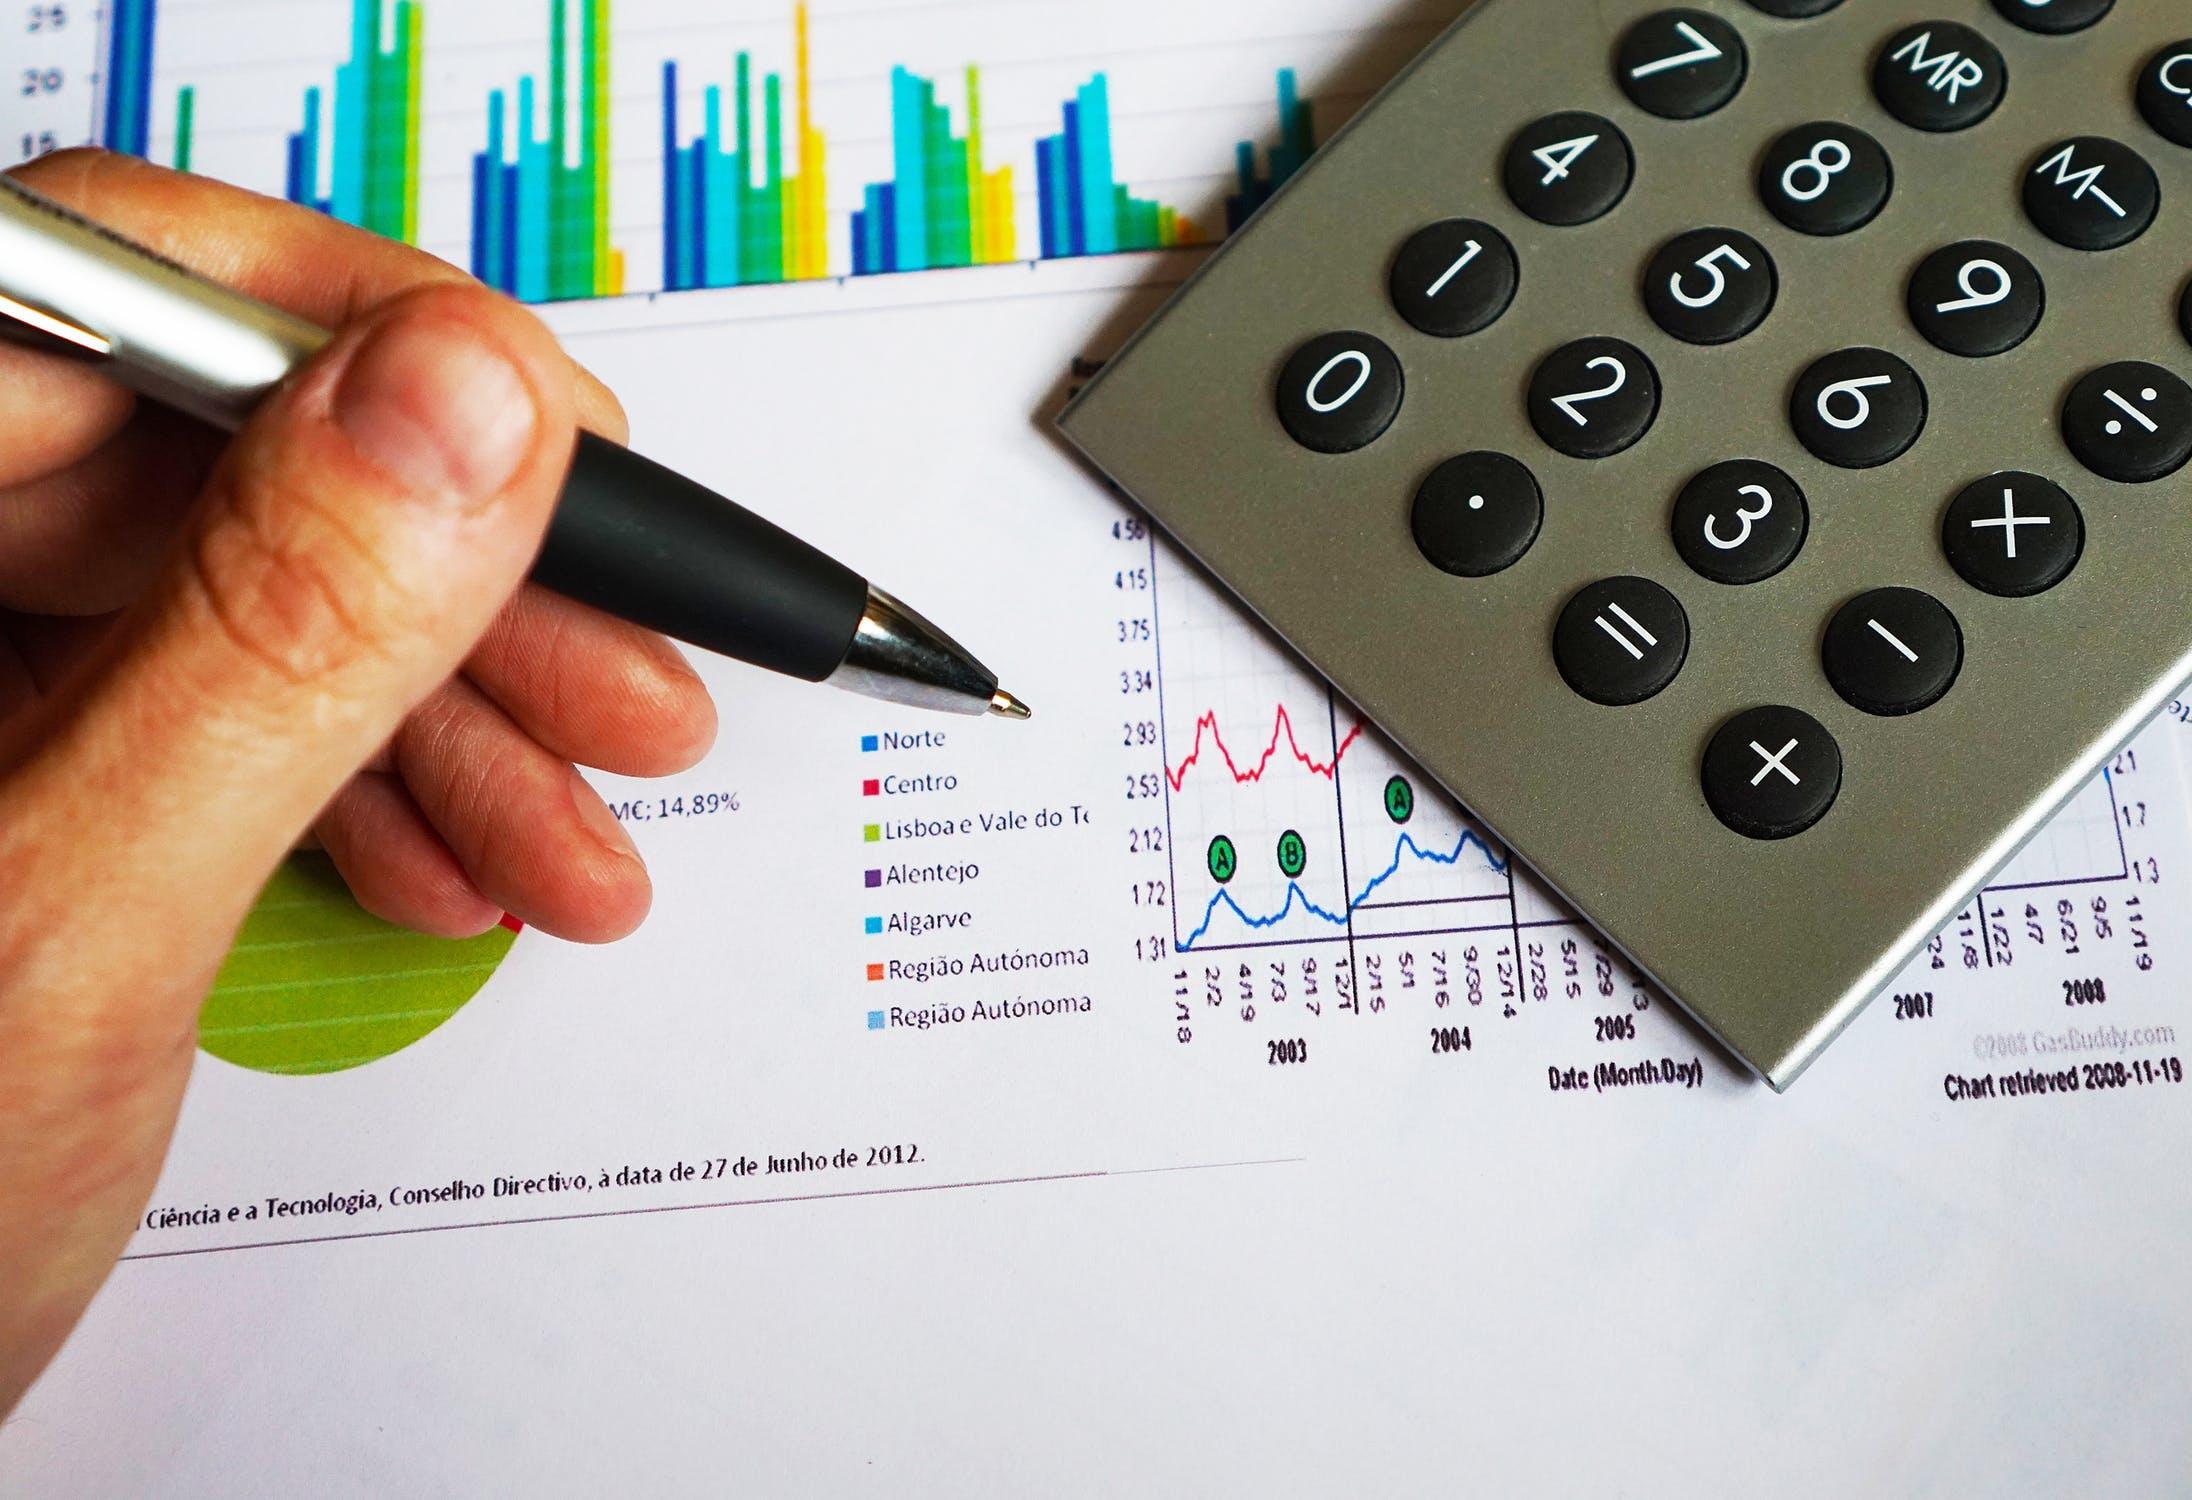 Family Files $18M Investor Fraud Lawsuit Against Securities America Alleging Broker Fraud